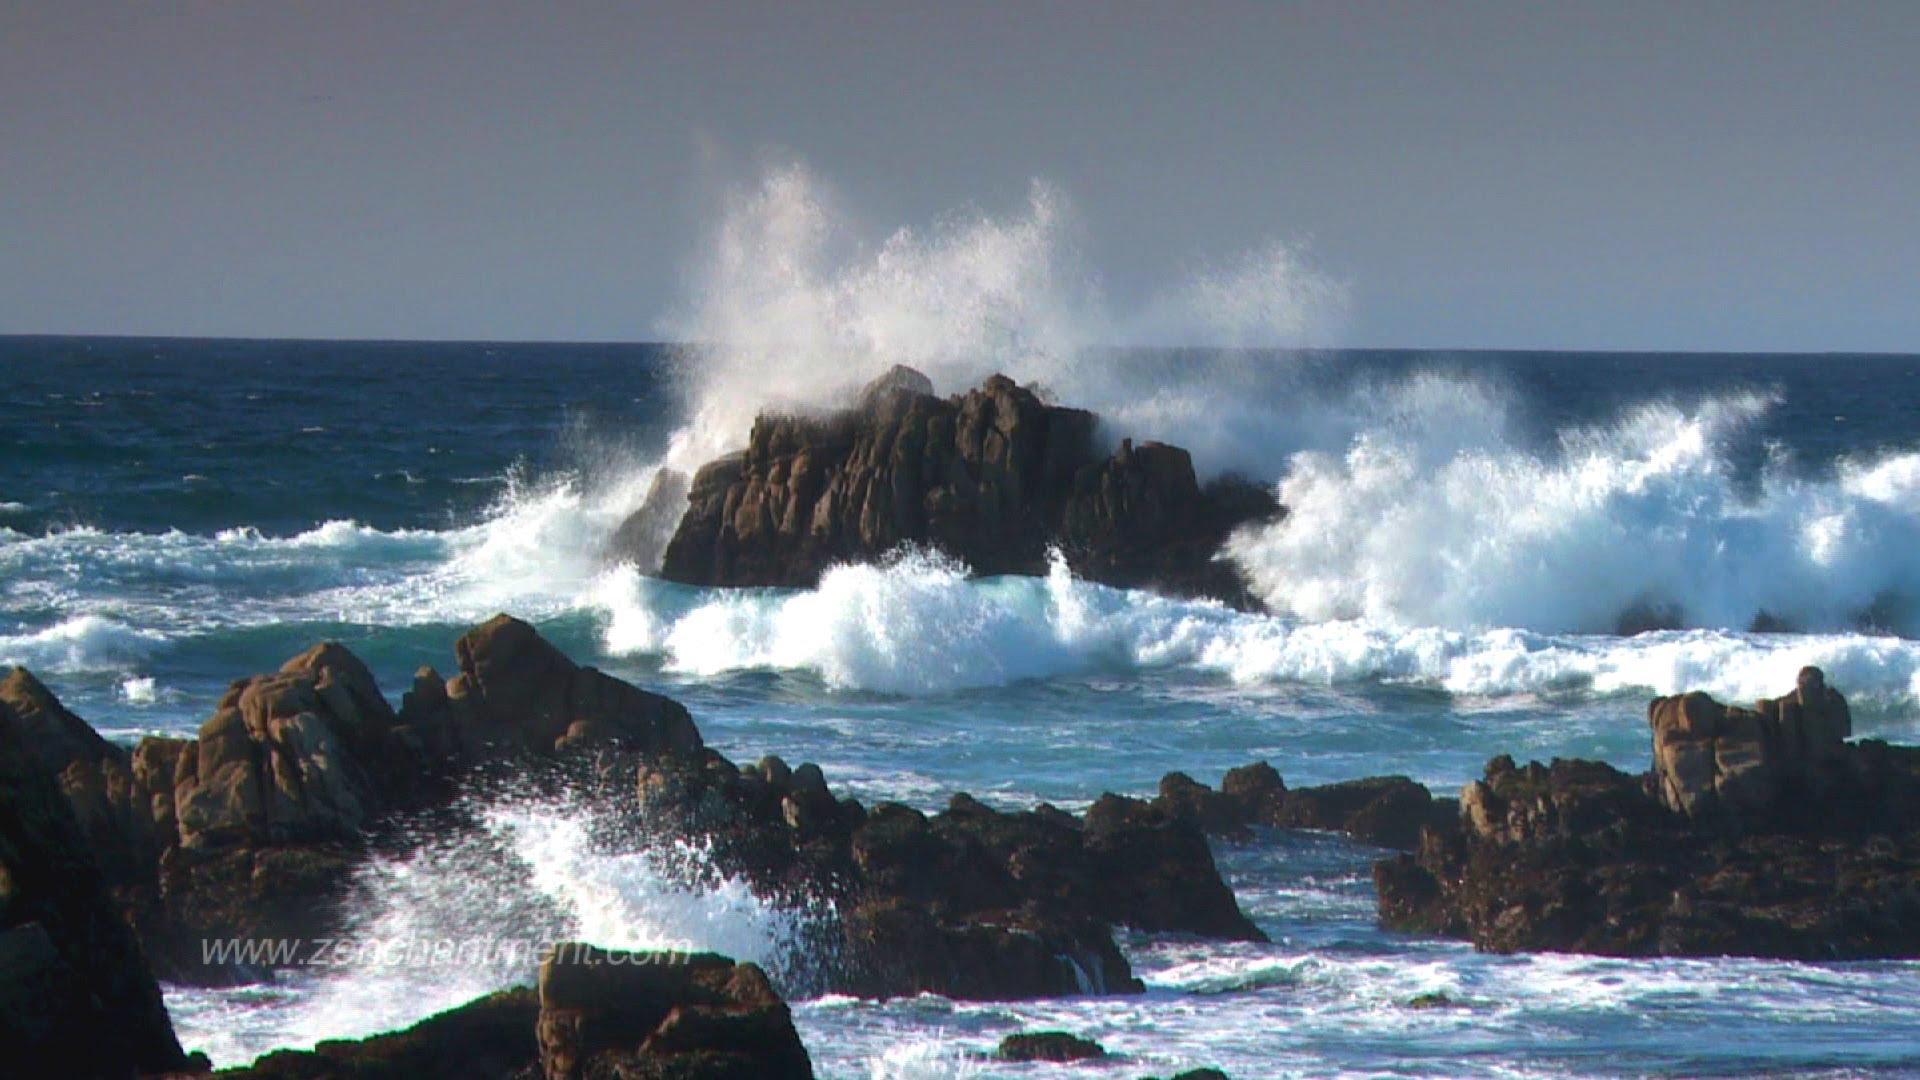 Zen Ocean Waves - Ocean Sounds Only (NO MUSIC) Aquatic Dream Therapy ...